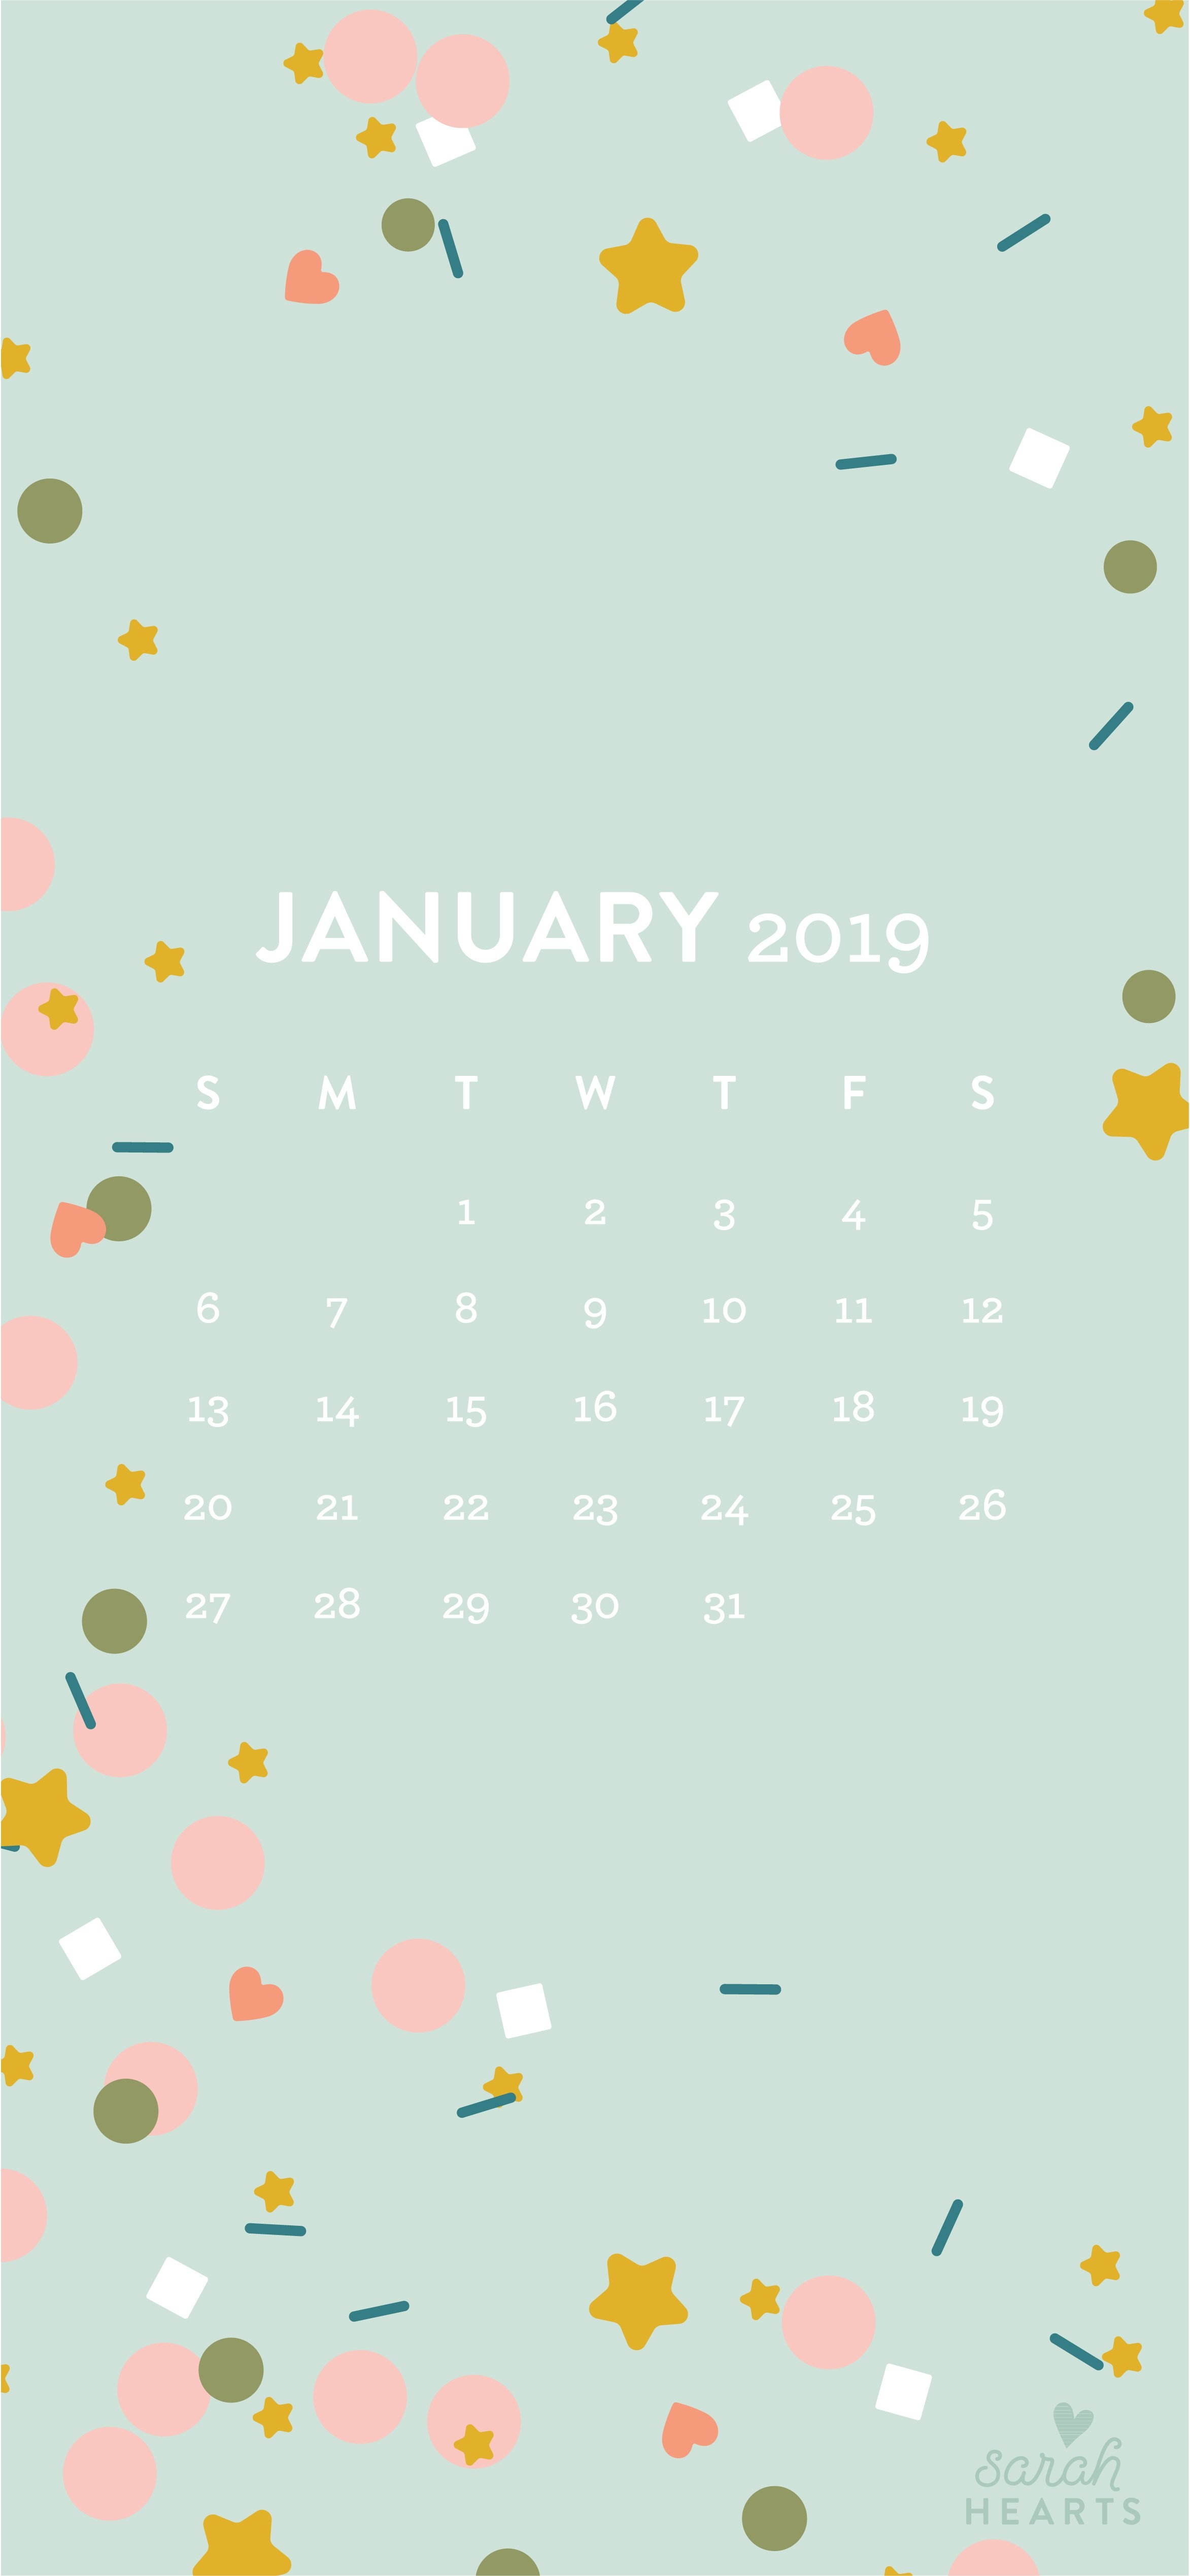 January 2019 Confetti Calendar Wallpaper - Sarah Hearts Calendar 2019 On My Iphone